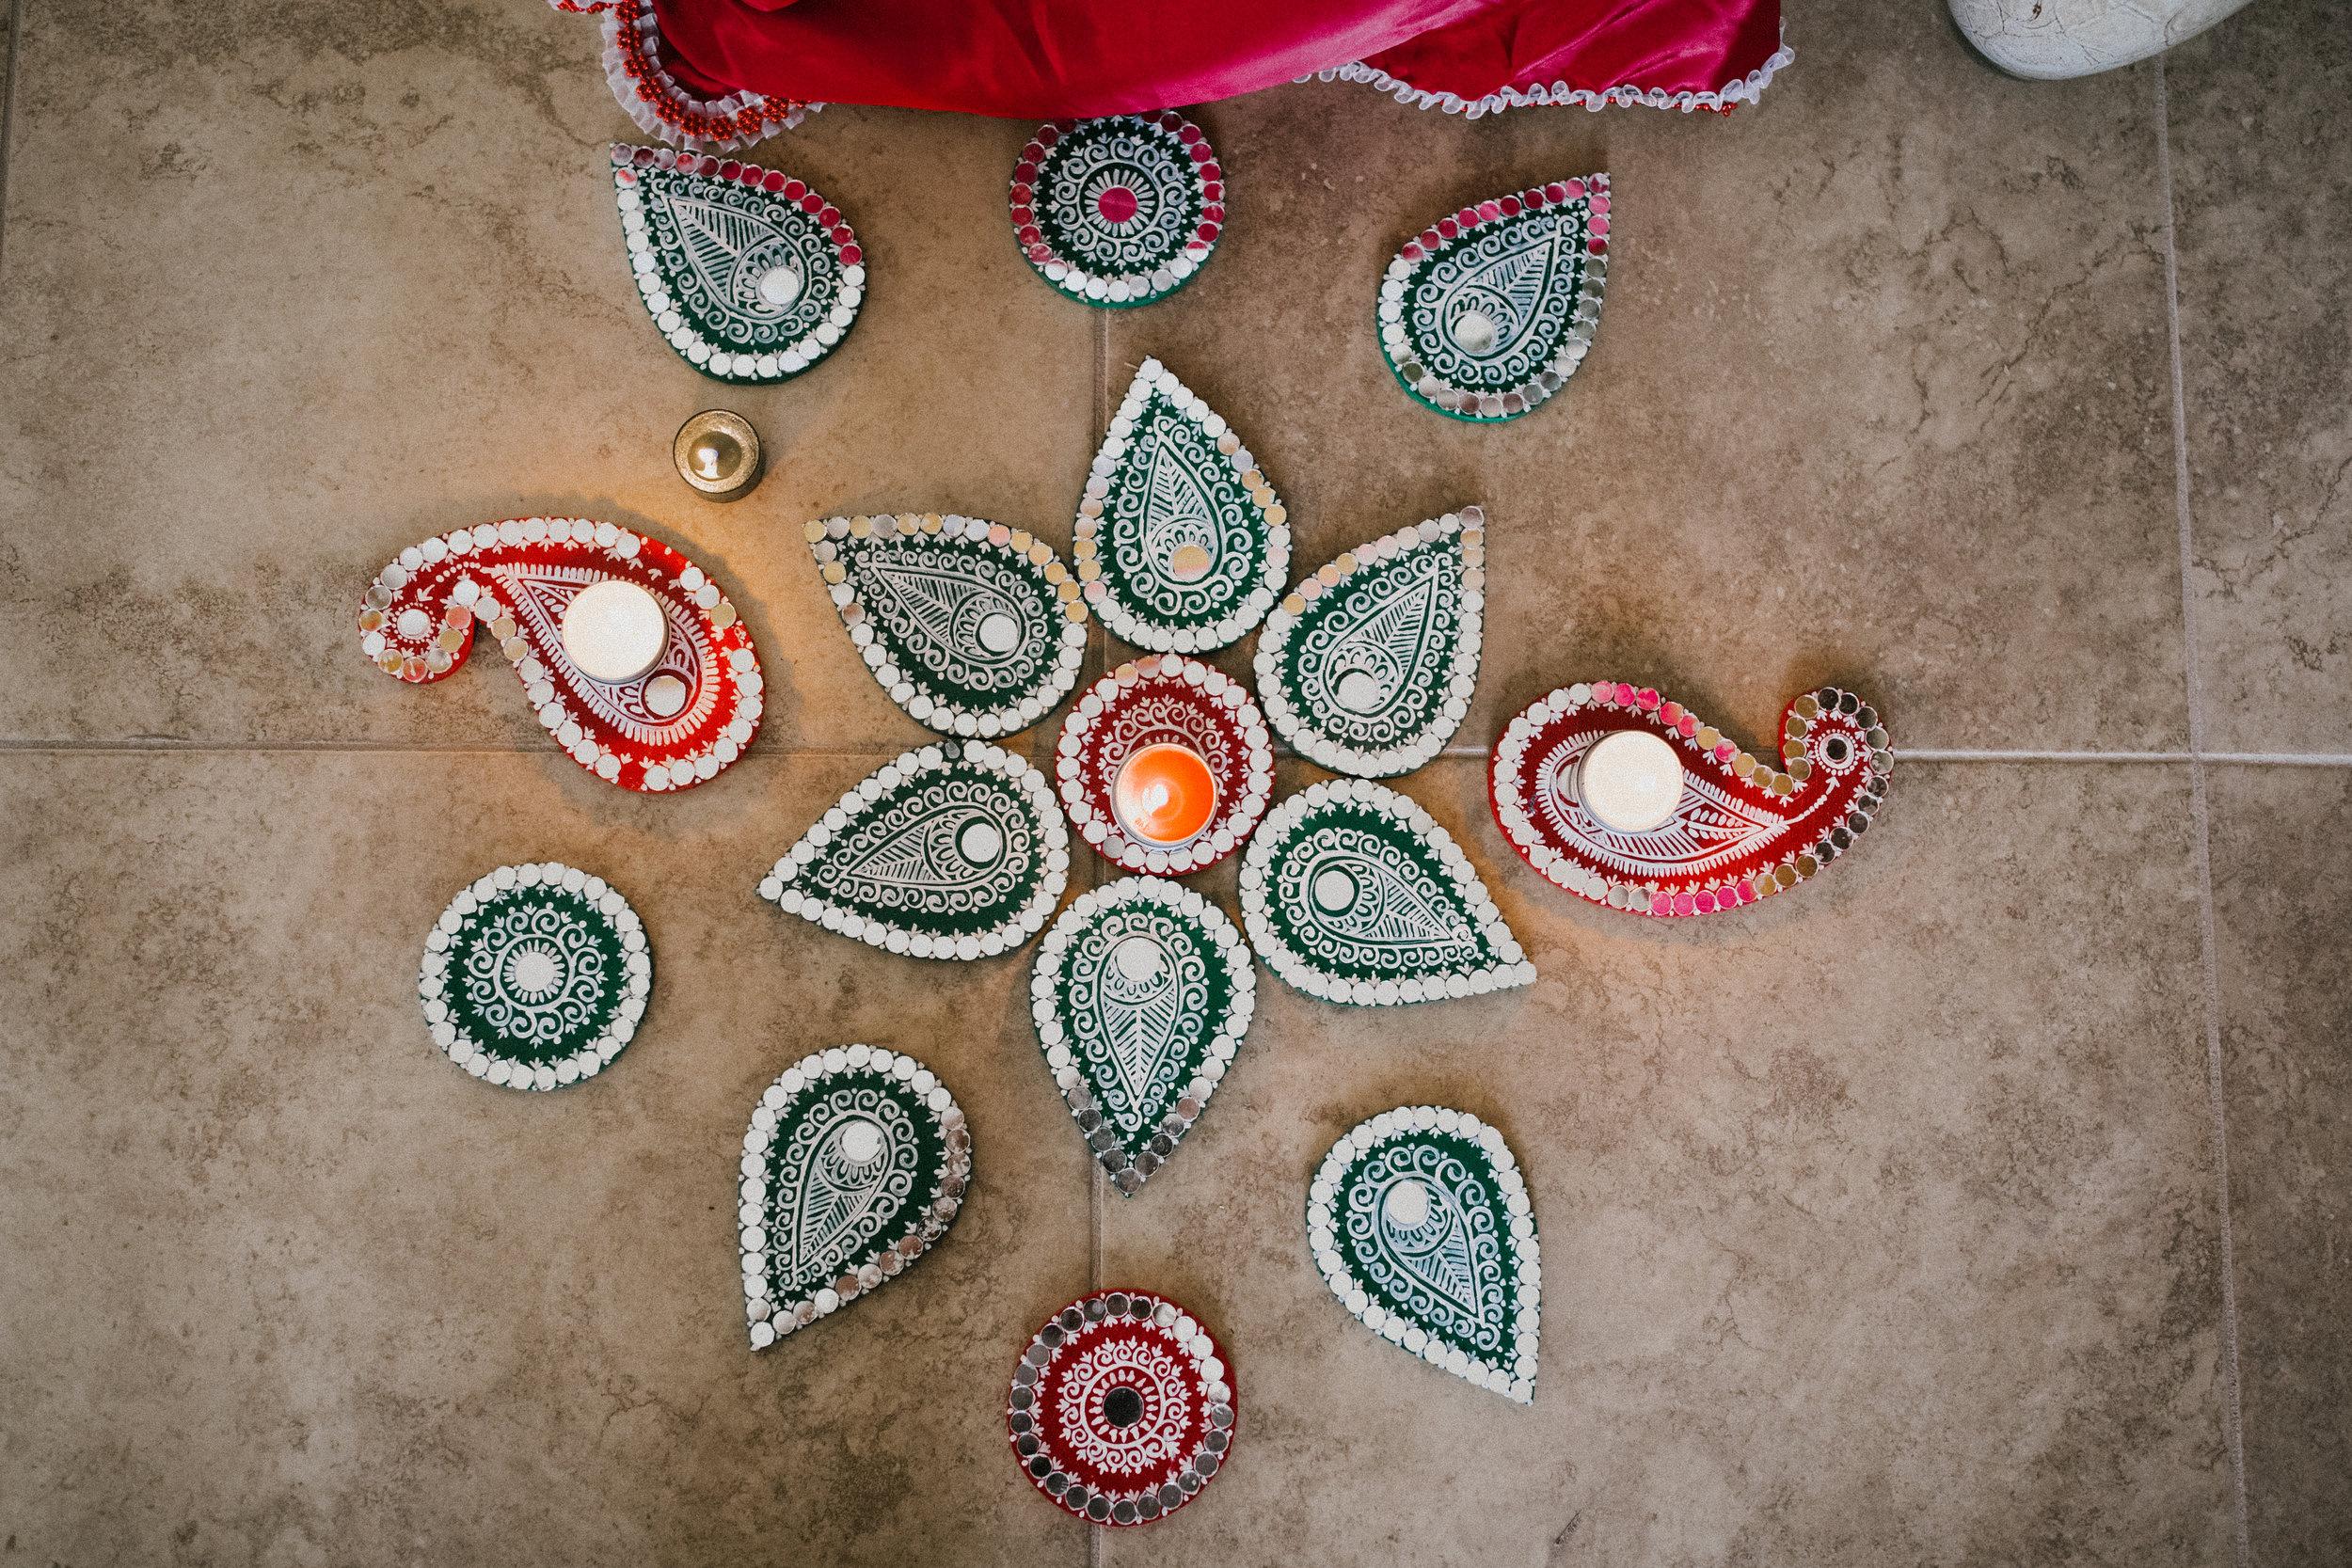 Aparna-Ankit-Patel-Mehndi-Wedding-Photos-0009.jpg